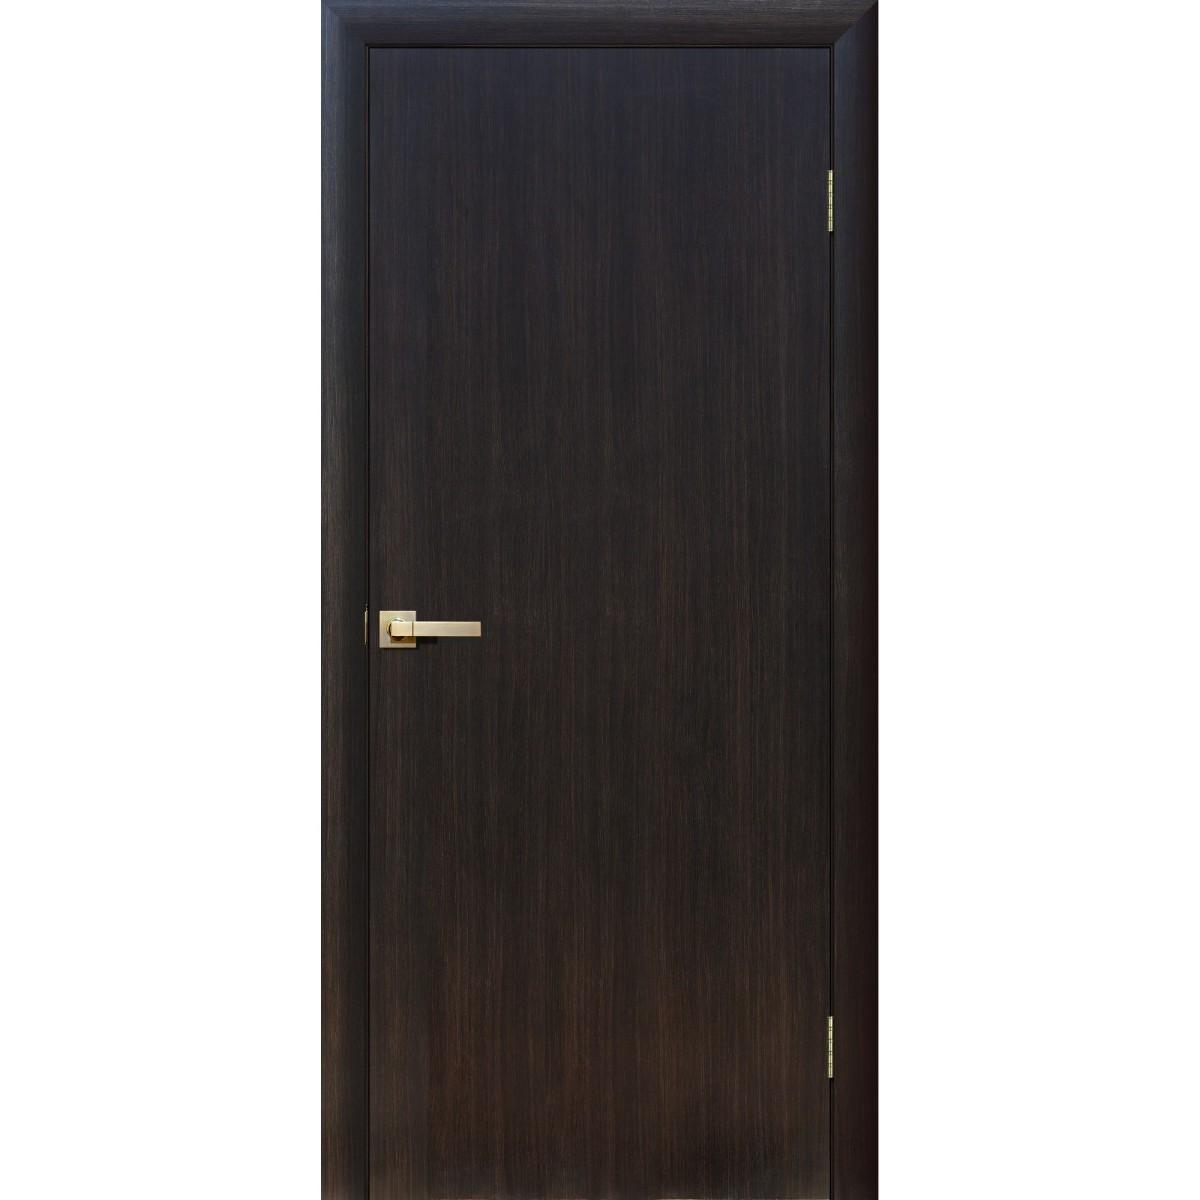 Дверь межкомнатная глухая Стандарт 90x200 см ламинация цвет дуб феррара